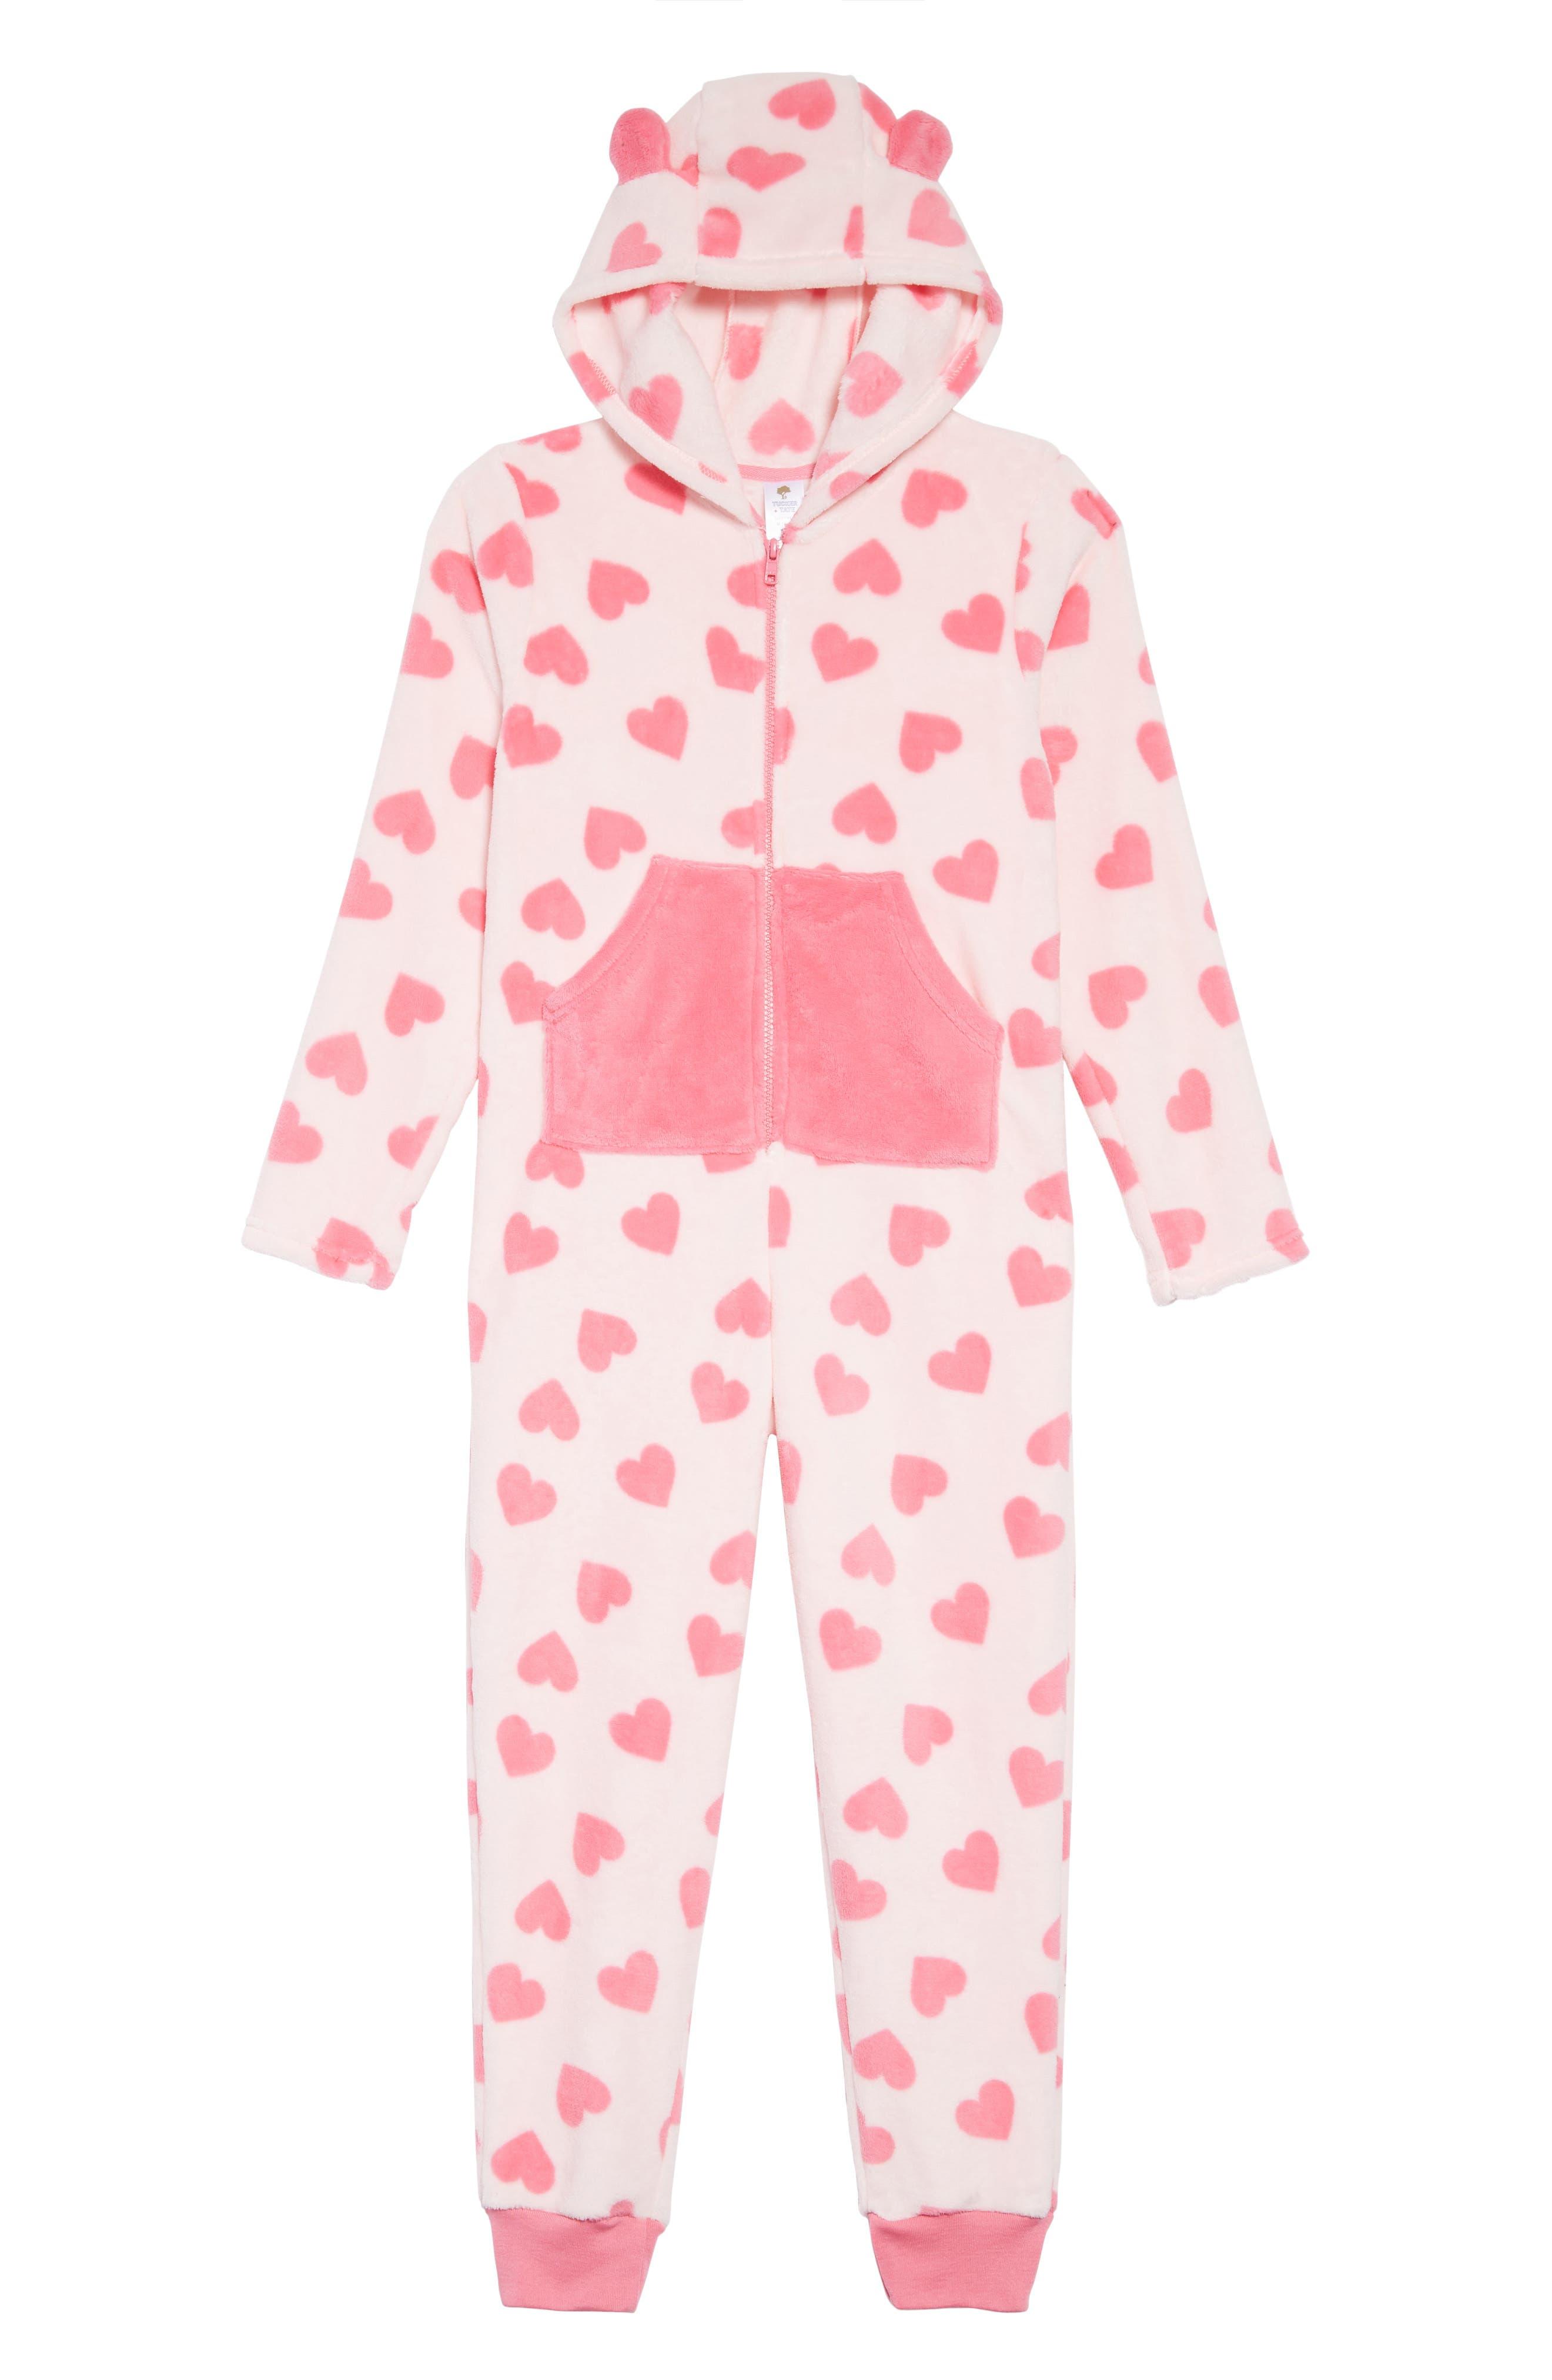 Girls Tucker  Tate OnePiece Pajamas Size XL (1416)  Pink